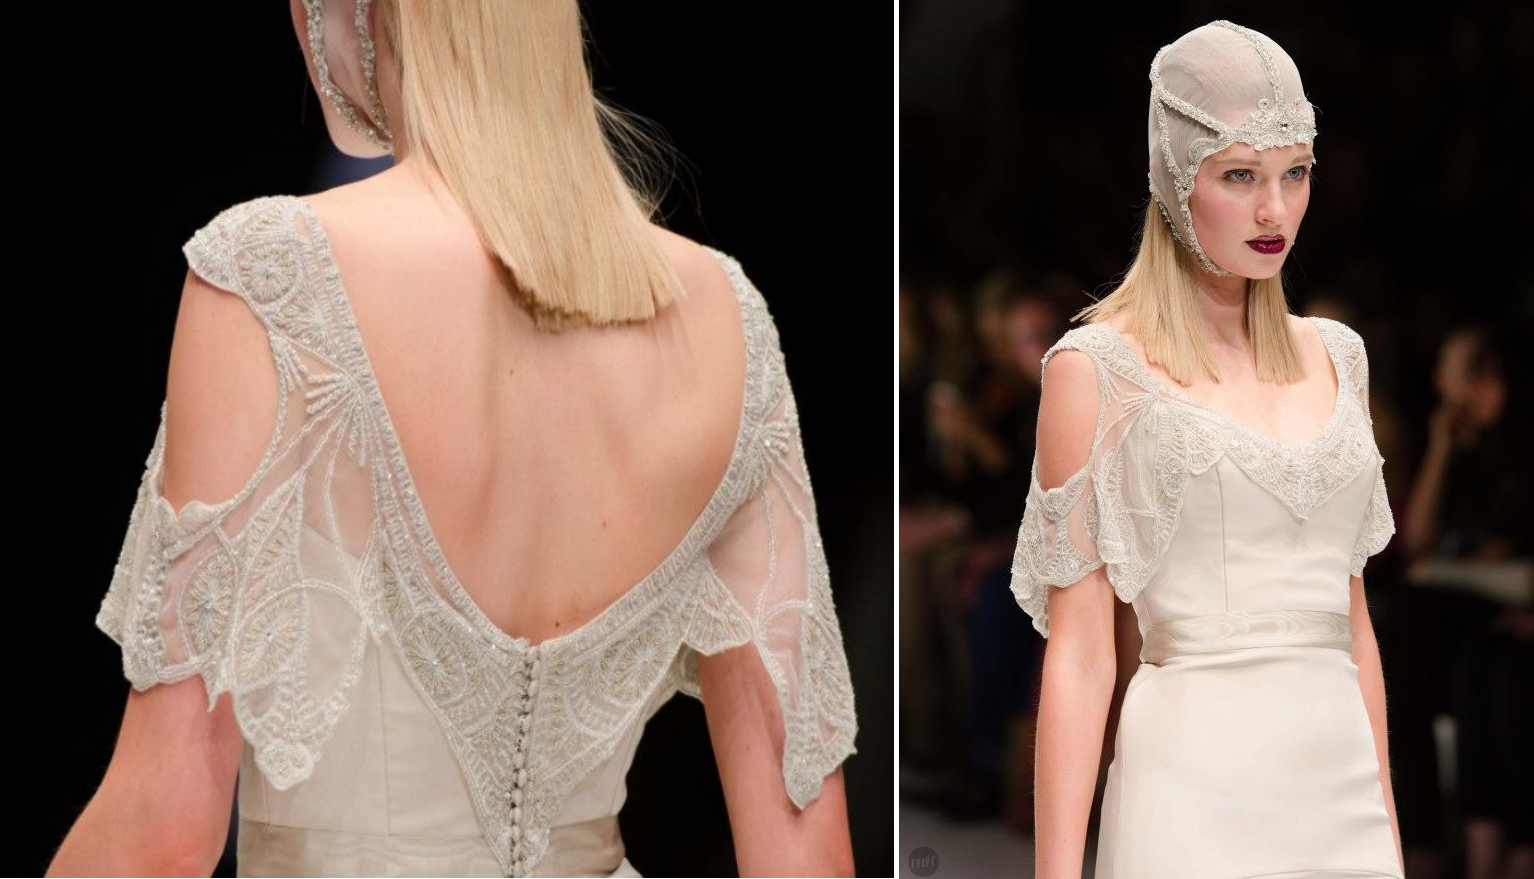 Evangeline by Gwendolynne at Melbourne Spring Fashion Week 2012